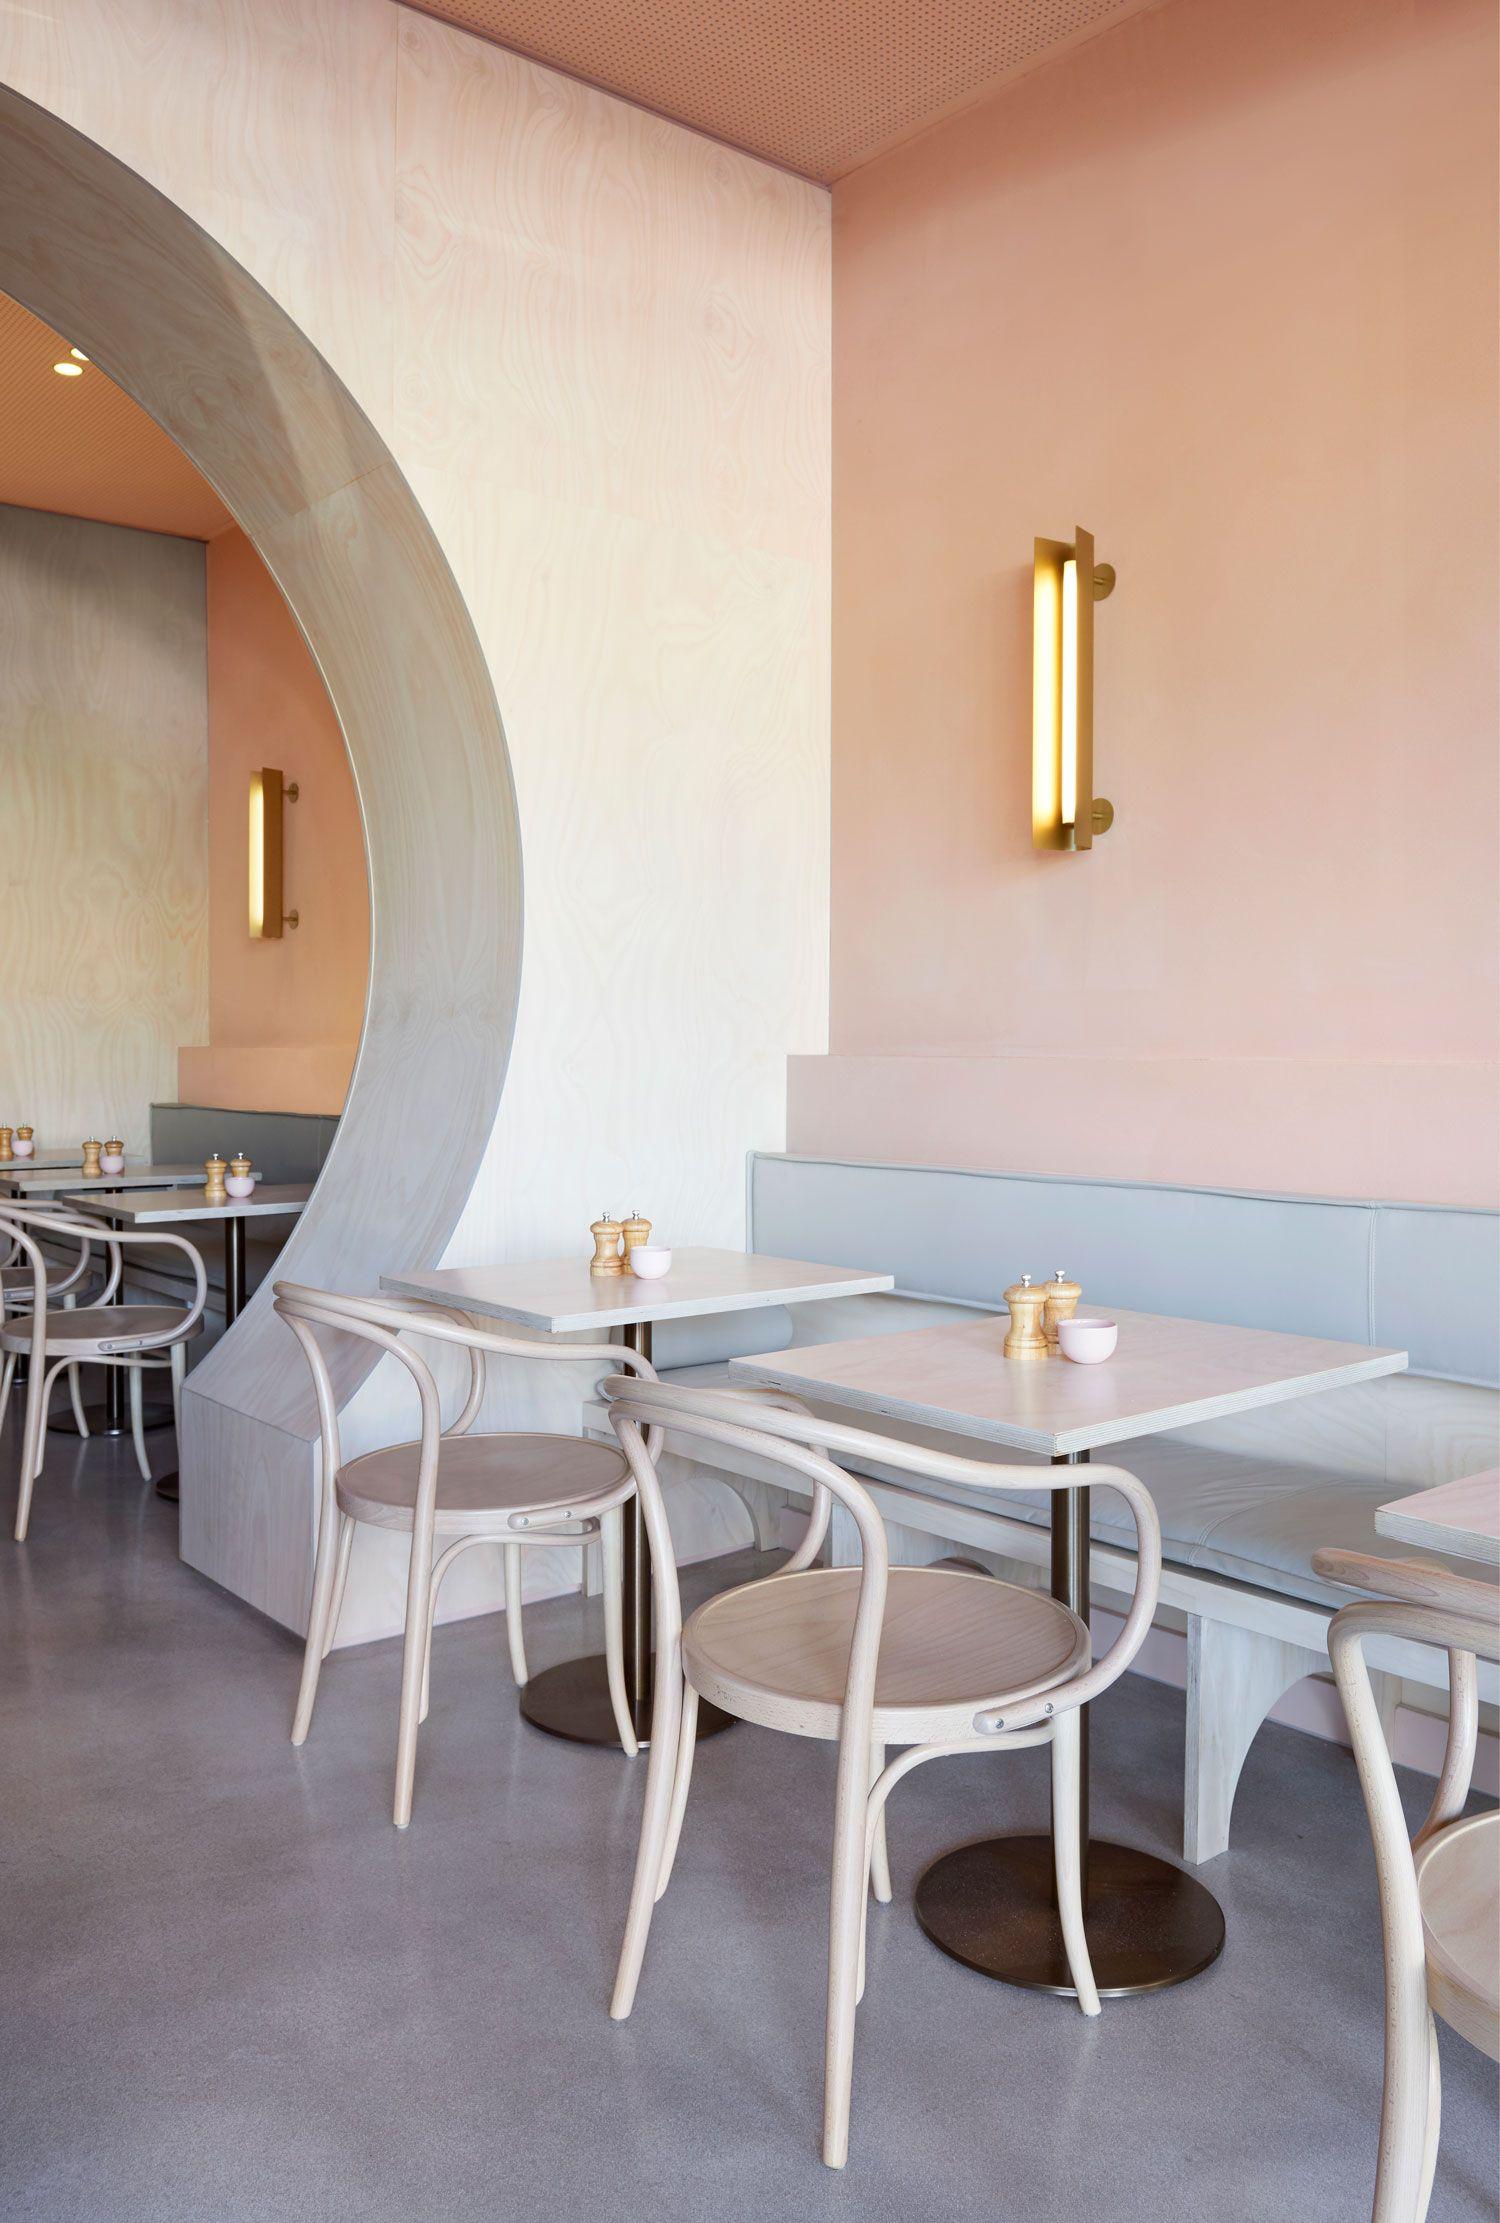 Workshop Brothers Glen Waverley By Studio Esteta Yellowtrace Restaurant Design Interior Dining Room Decor